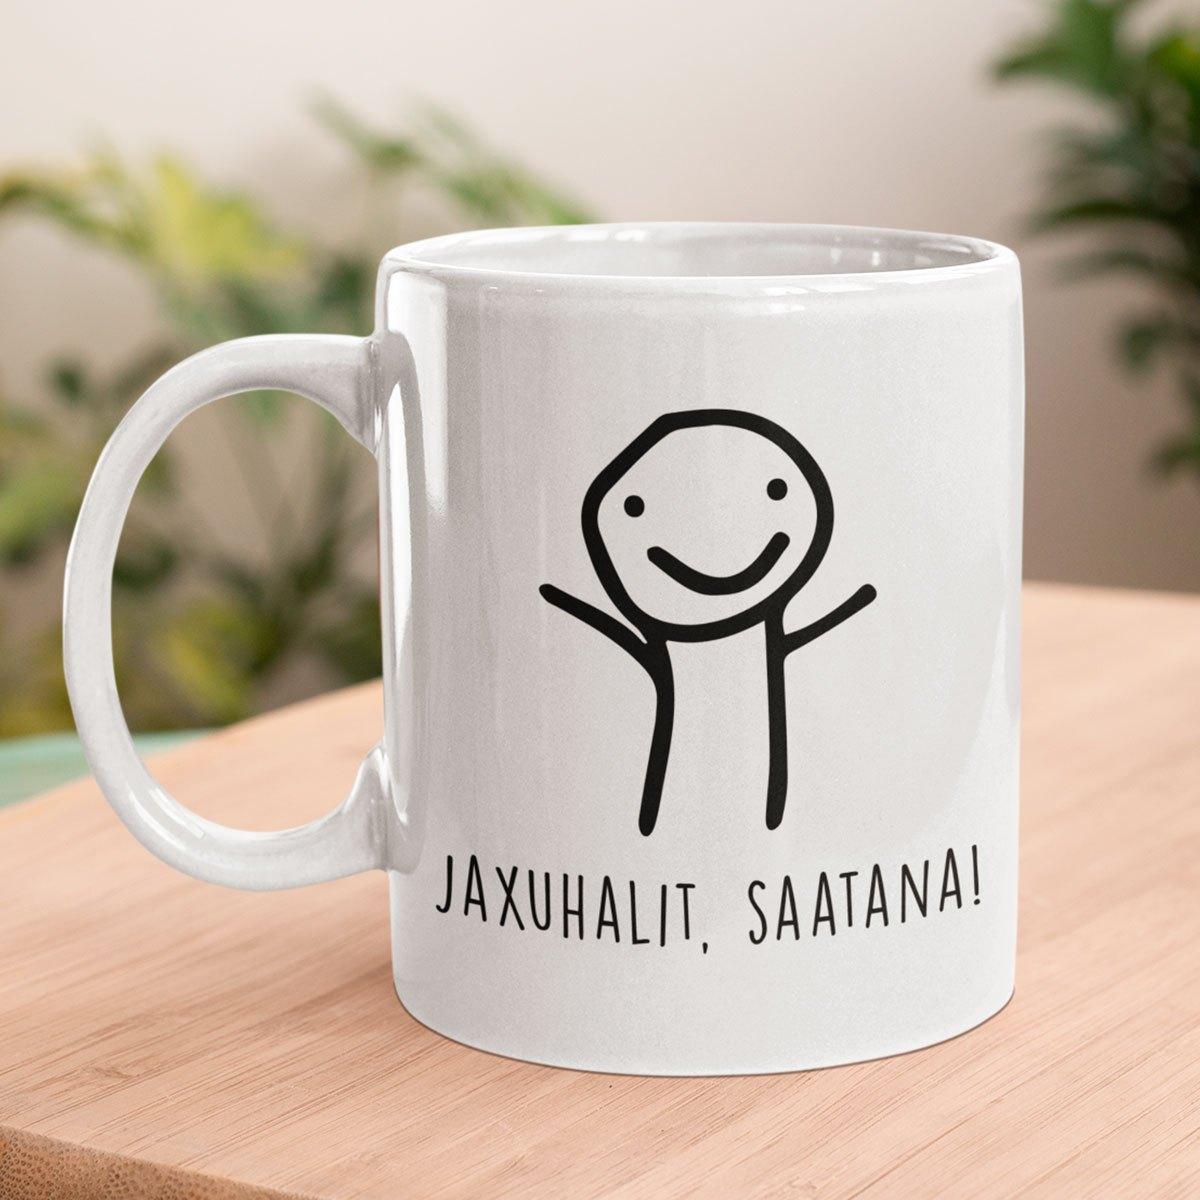 Jaxuhalit kahvikuppi Paskakauppa